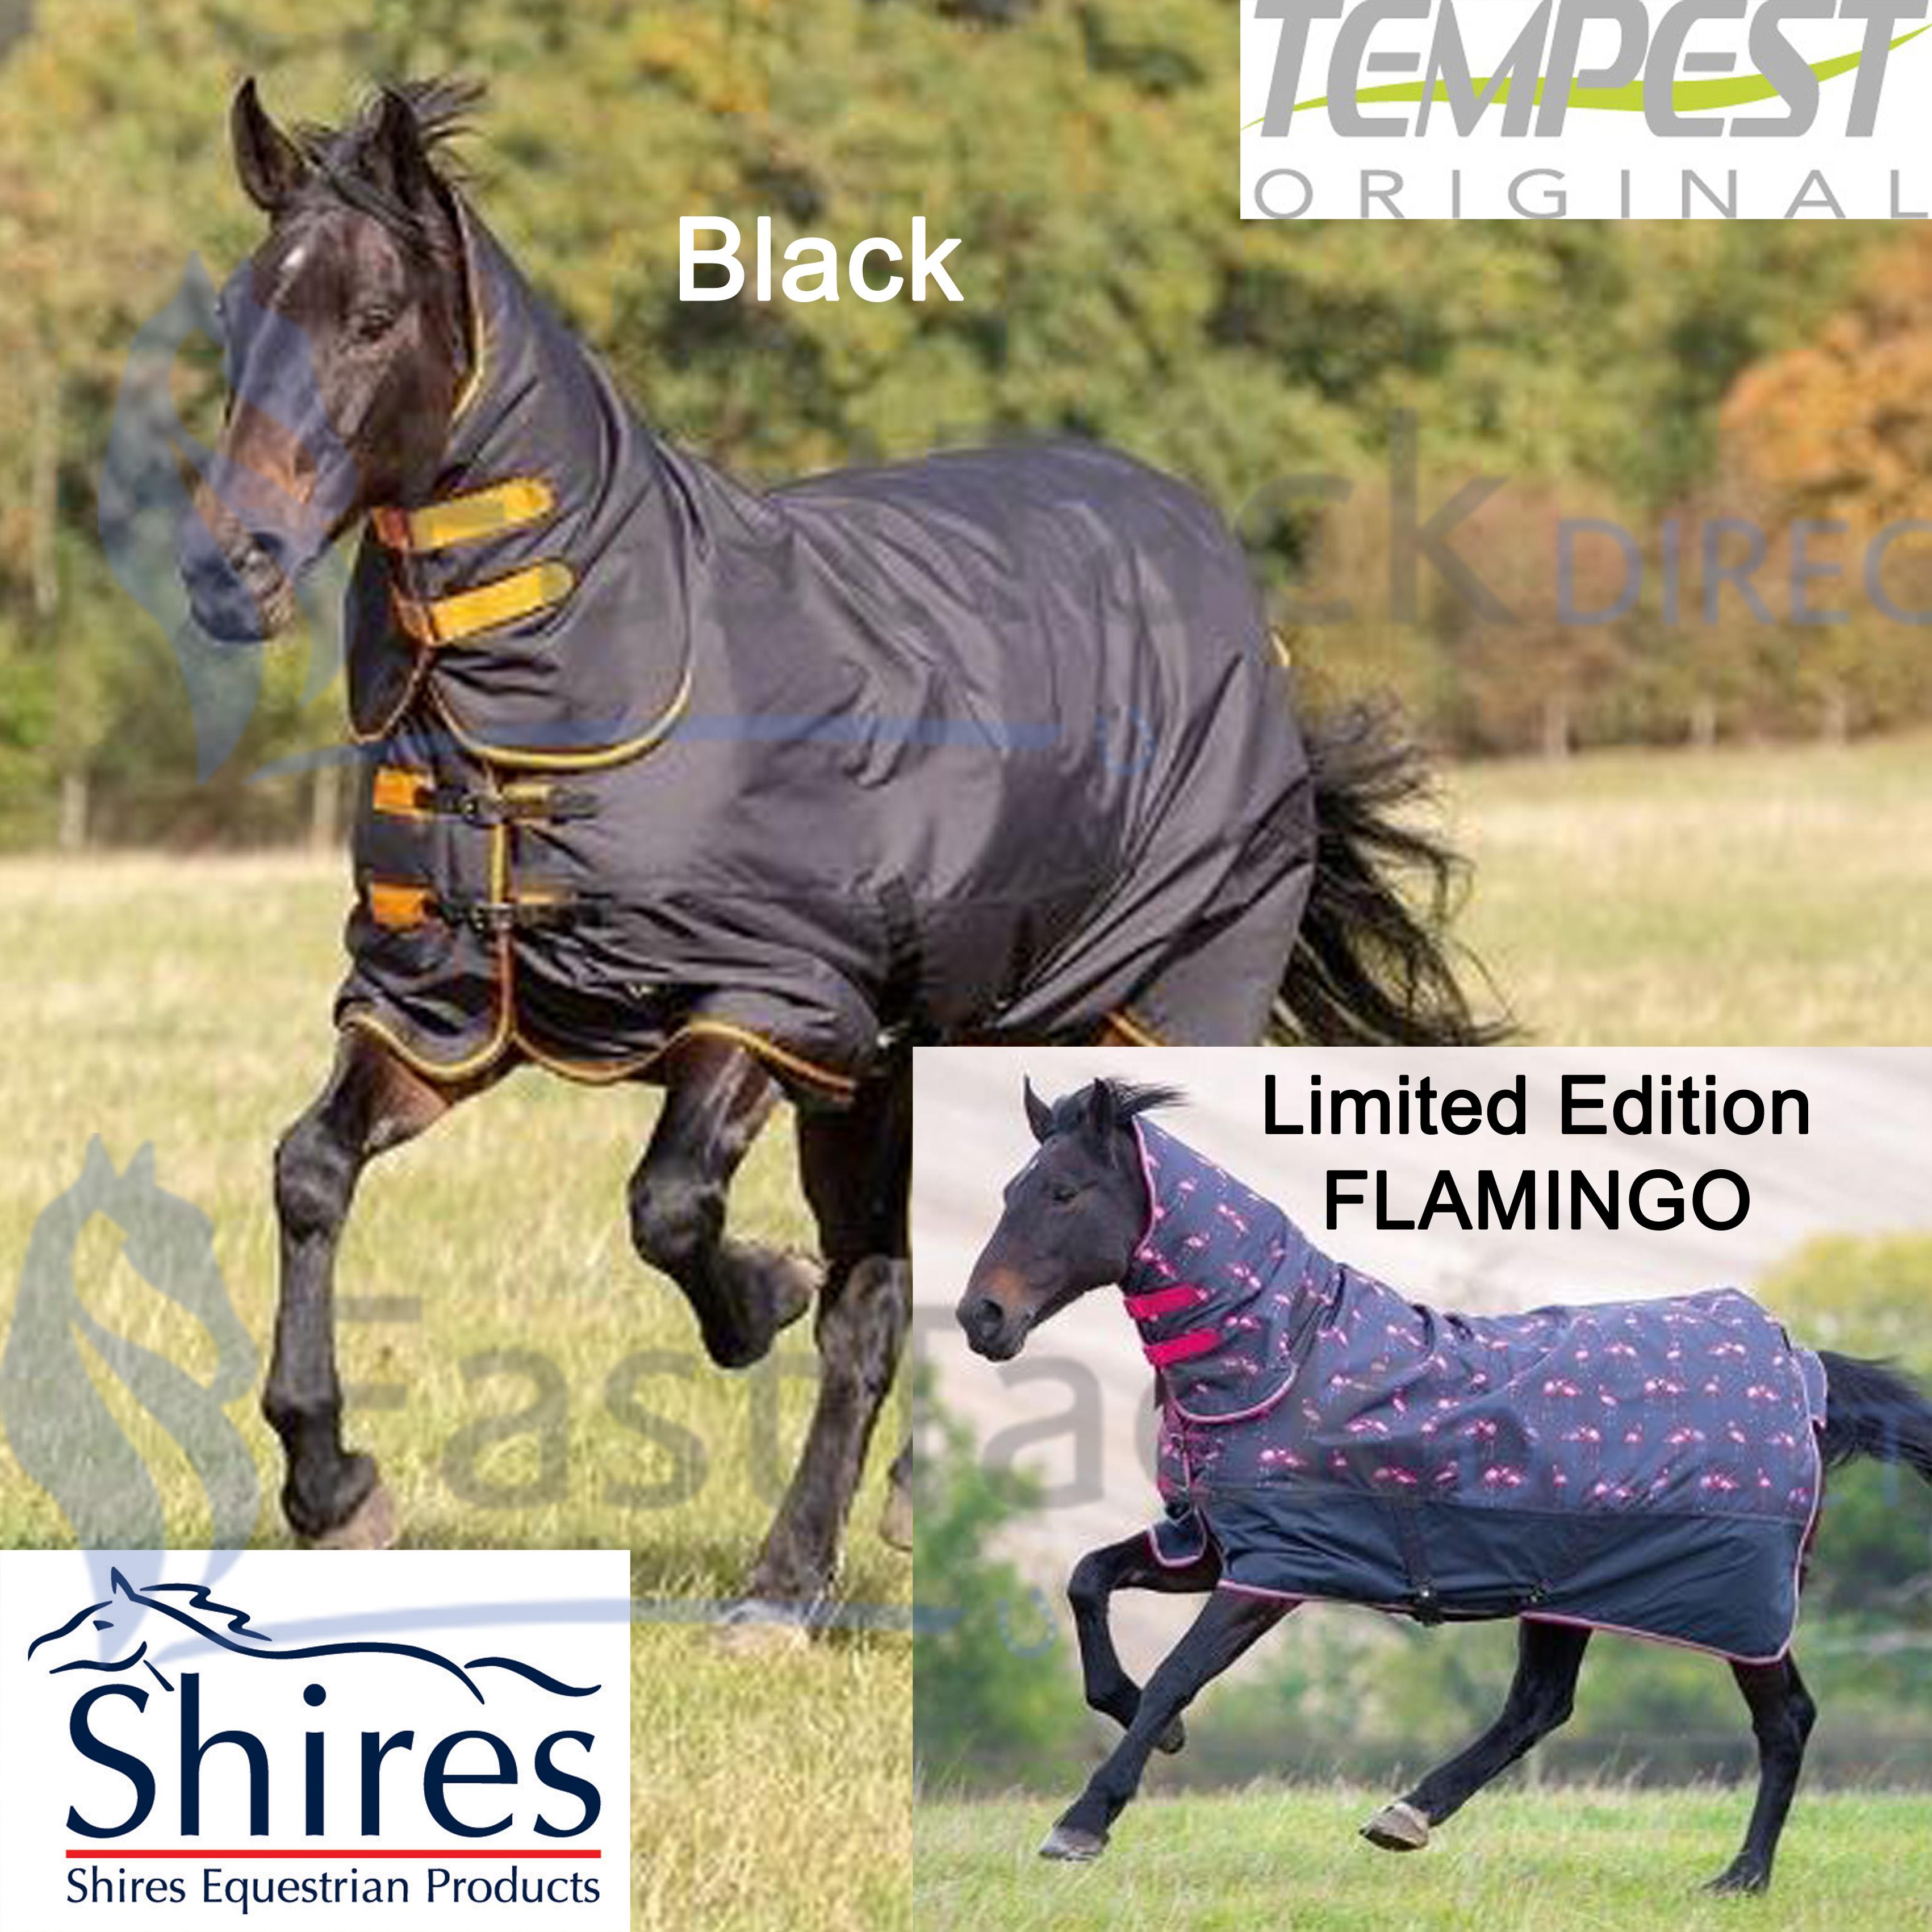 9332 Shires Tempest Original 200g Medium Weight Combo Neck